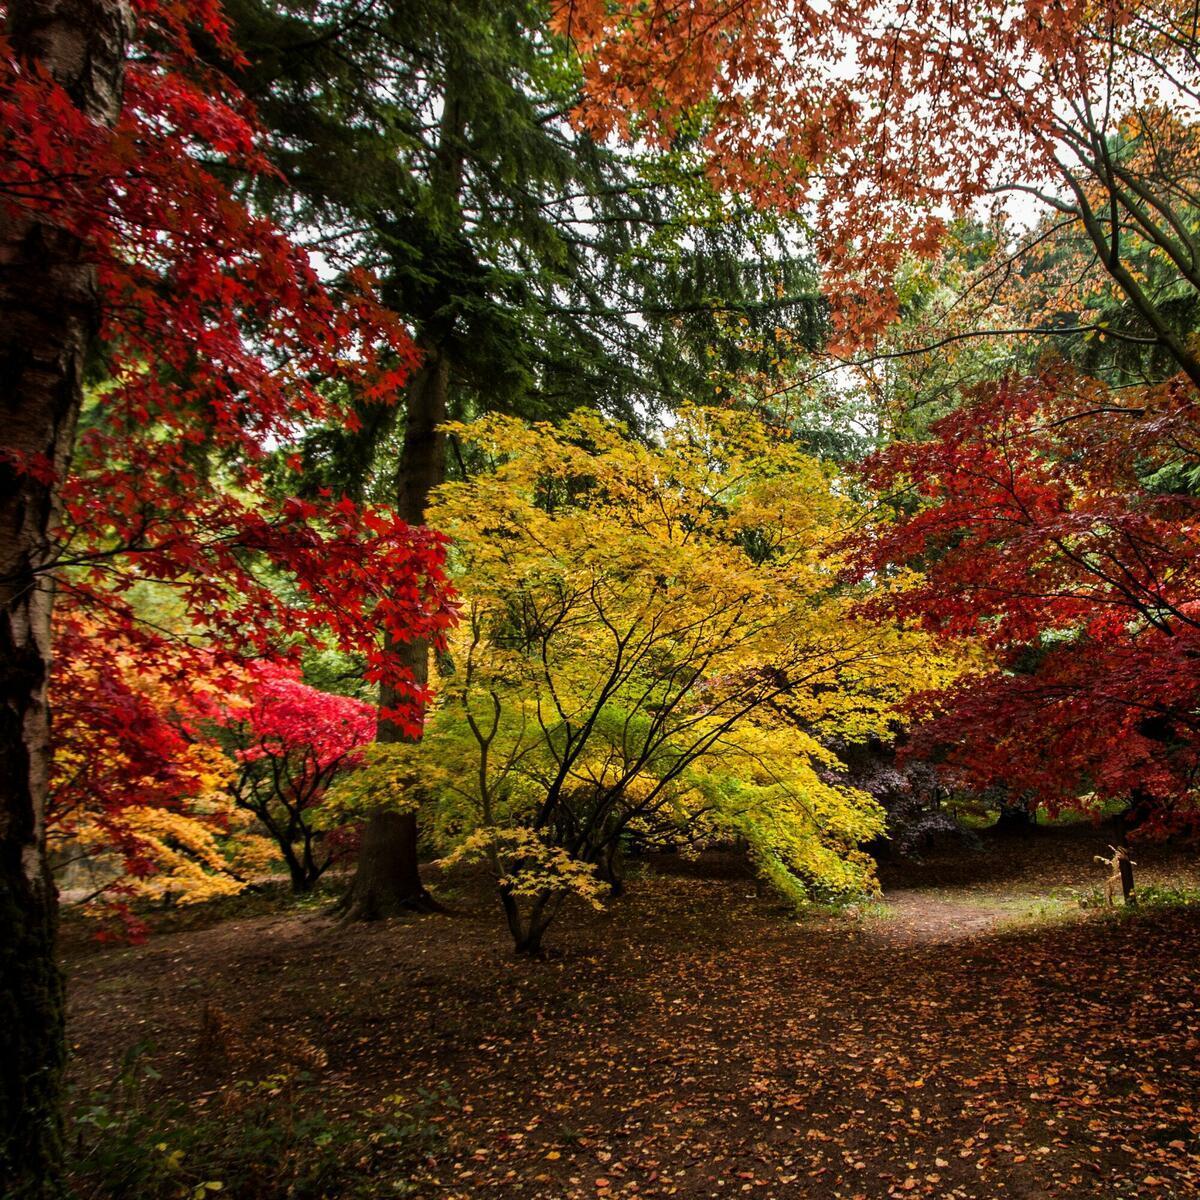 The Autumn Garden, Queenswood Arboretum (c) Natalie Jolley